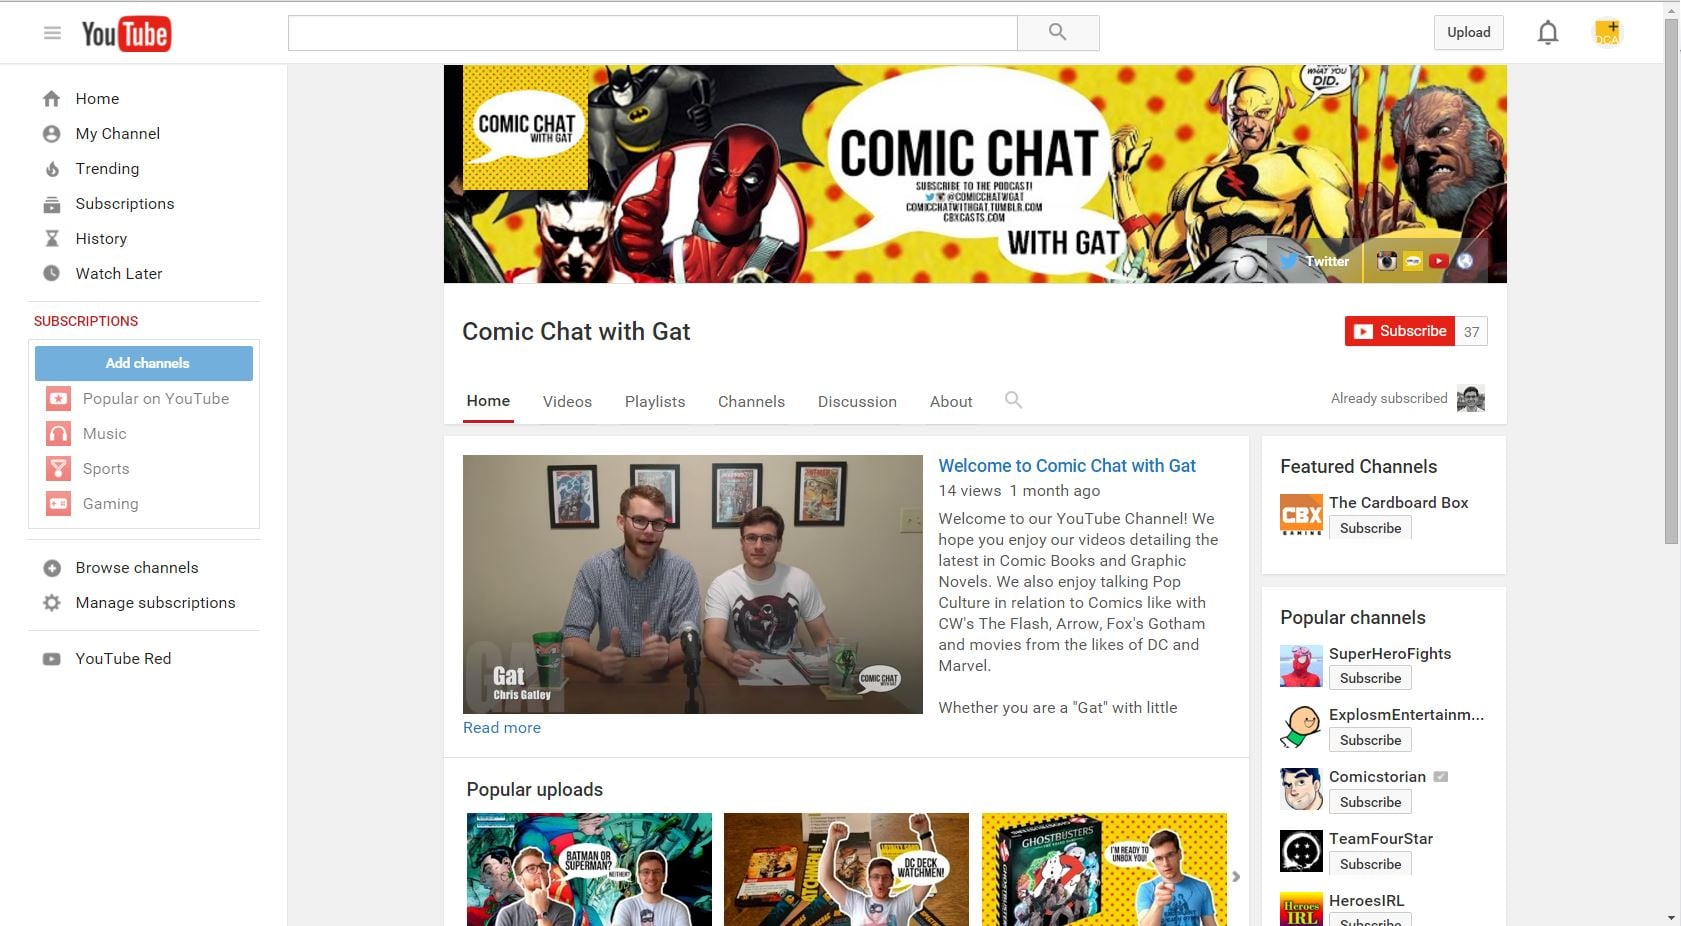 Copy of comic chat YT.JPG